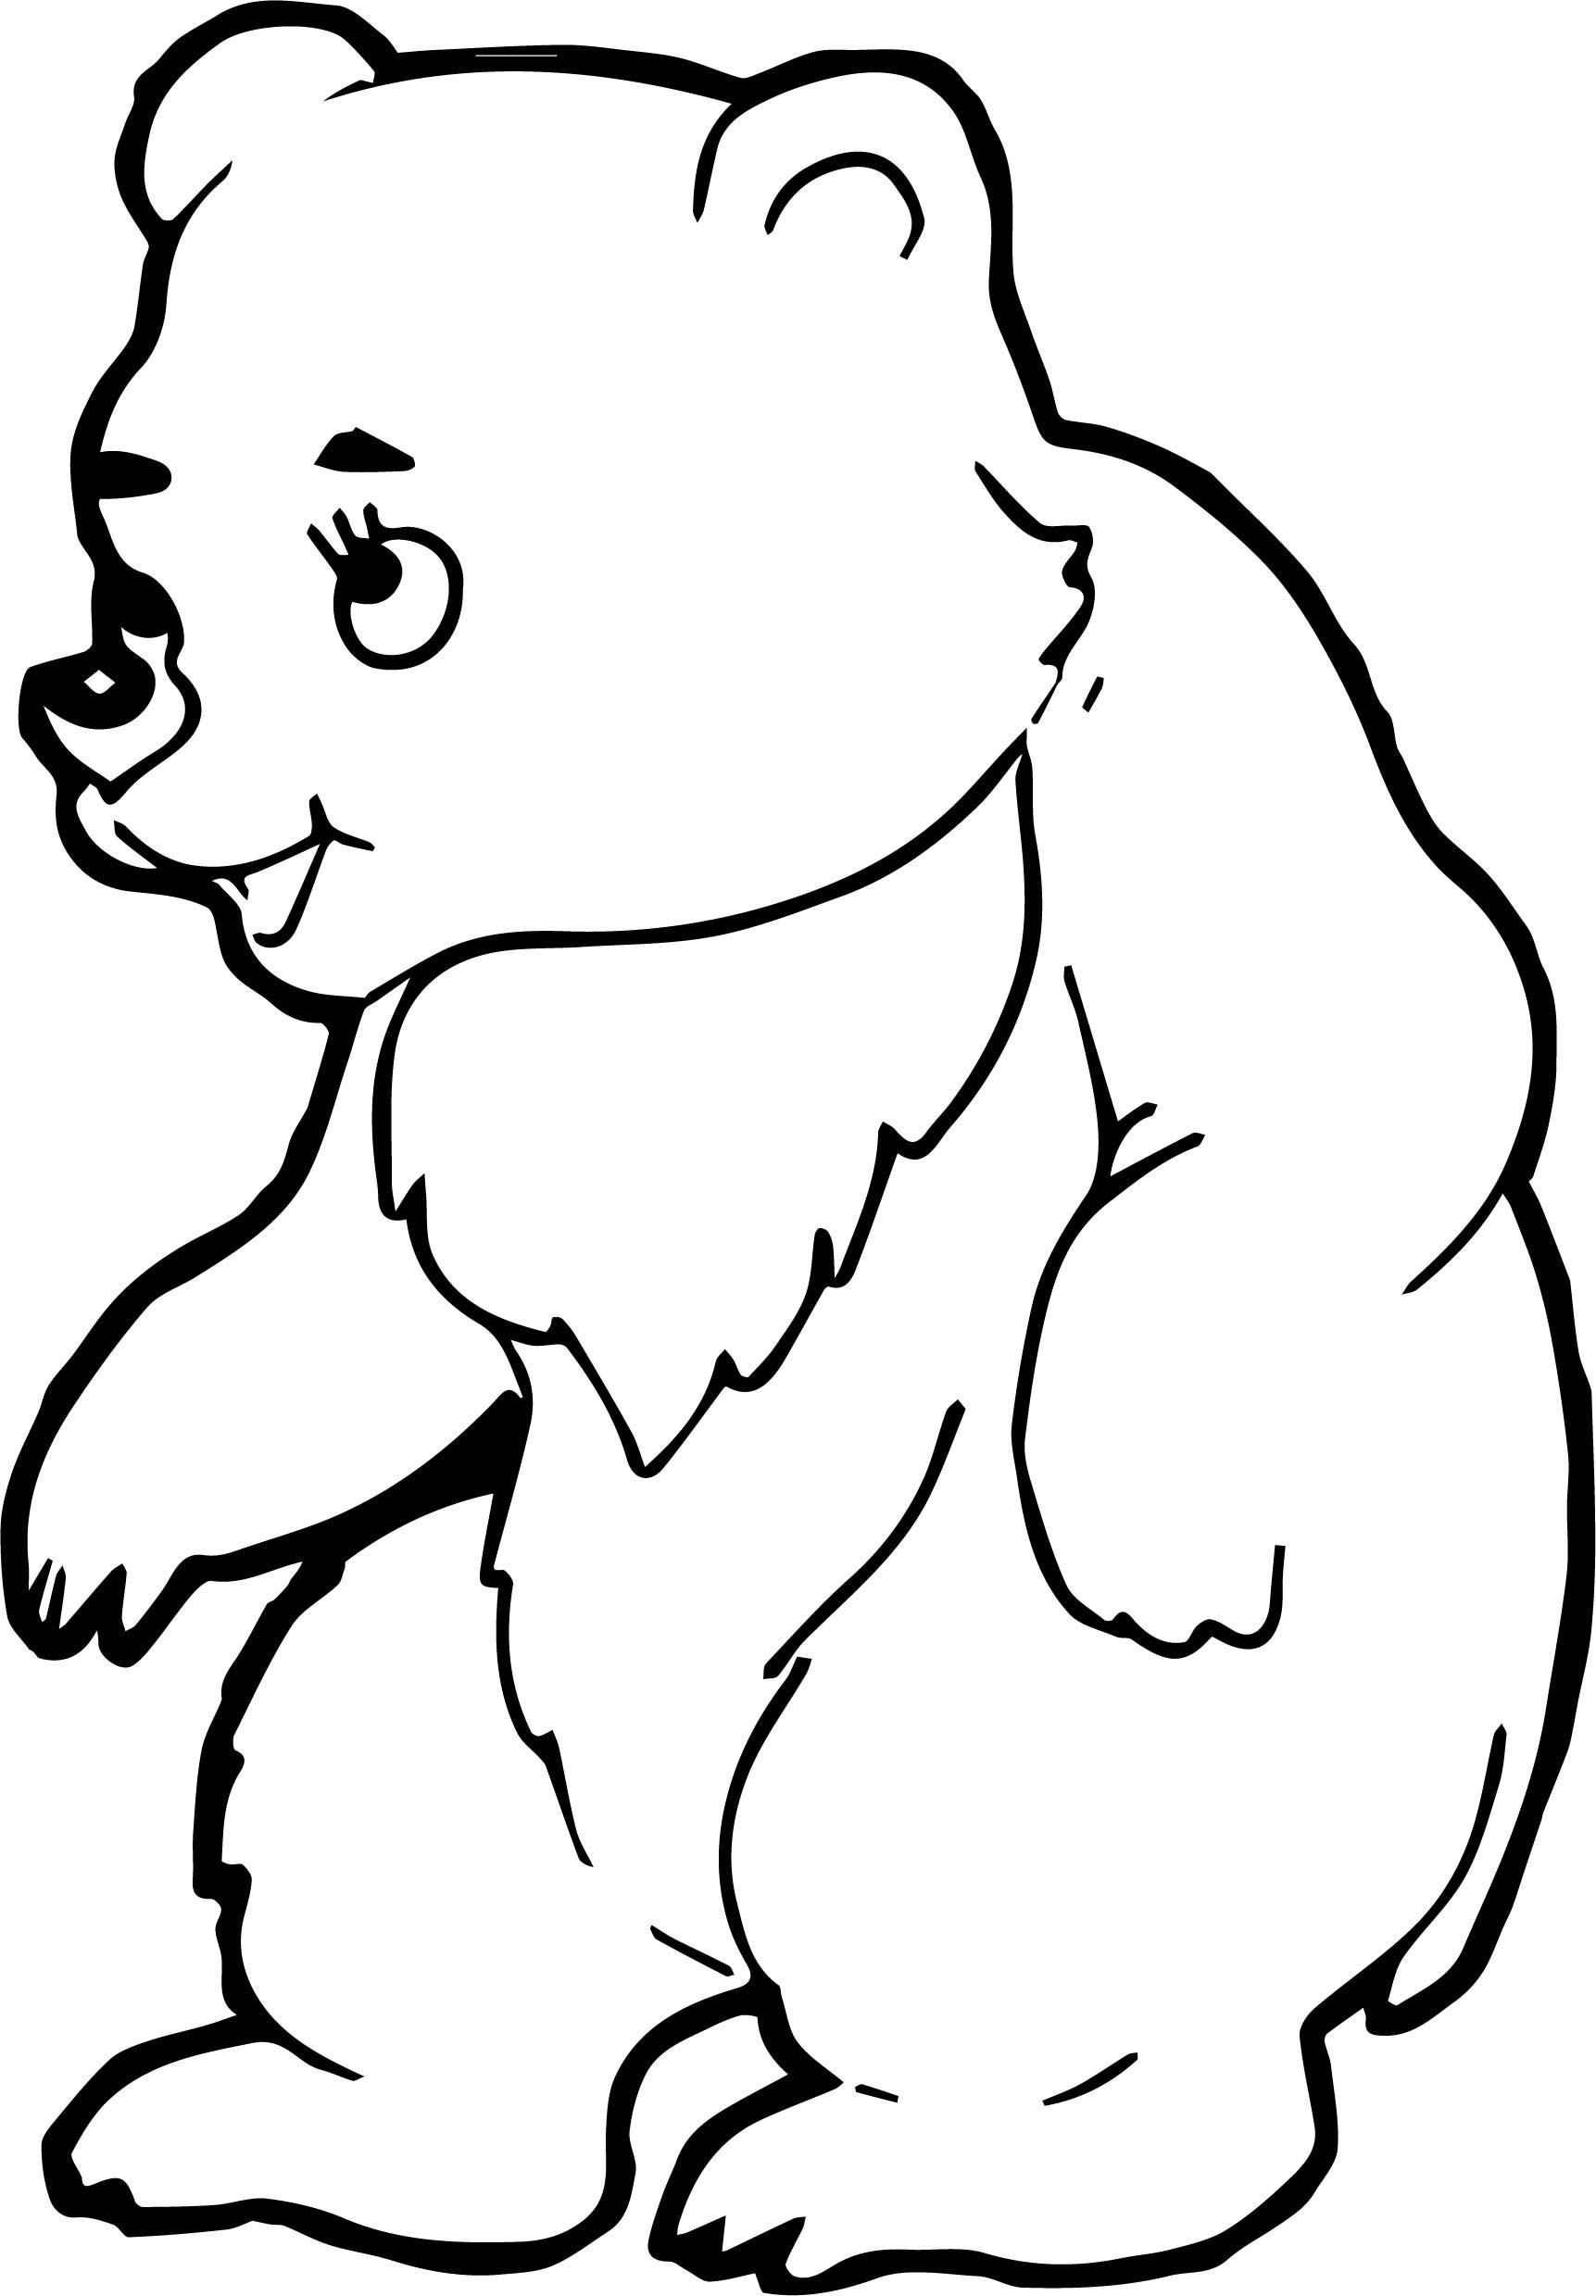 Bear Talking Coloring Page